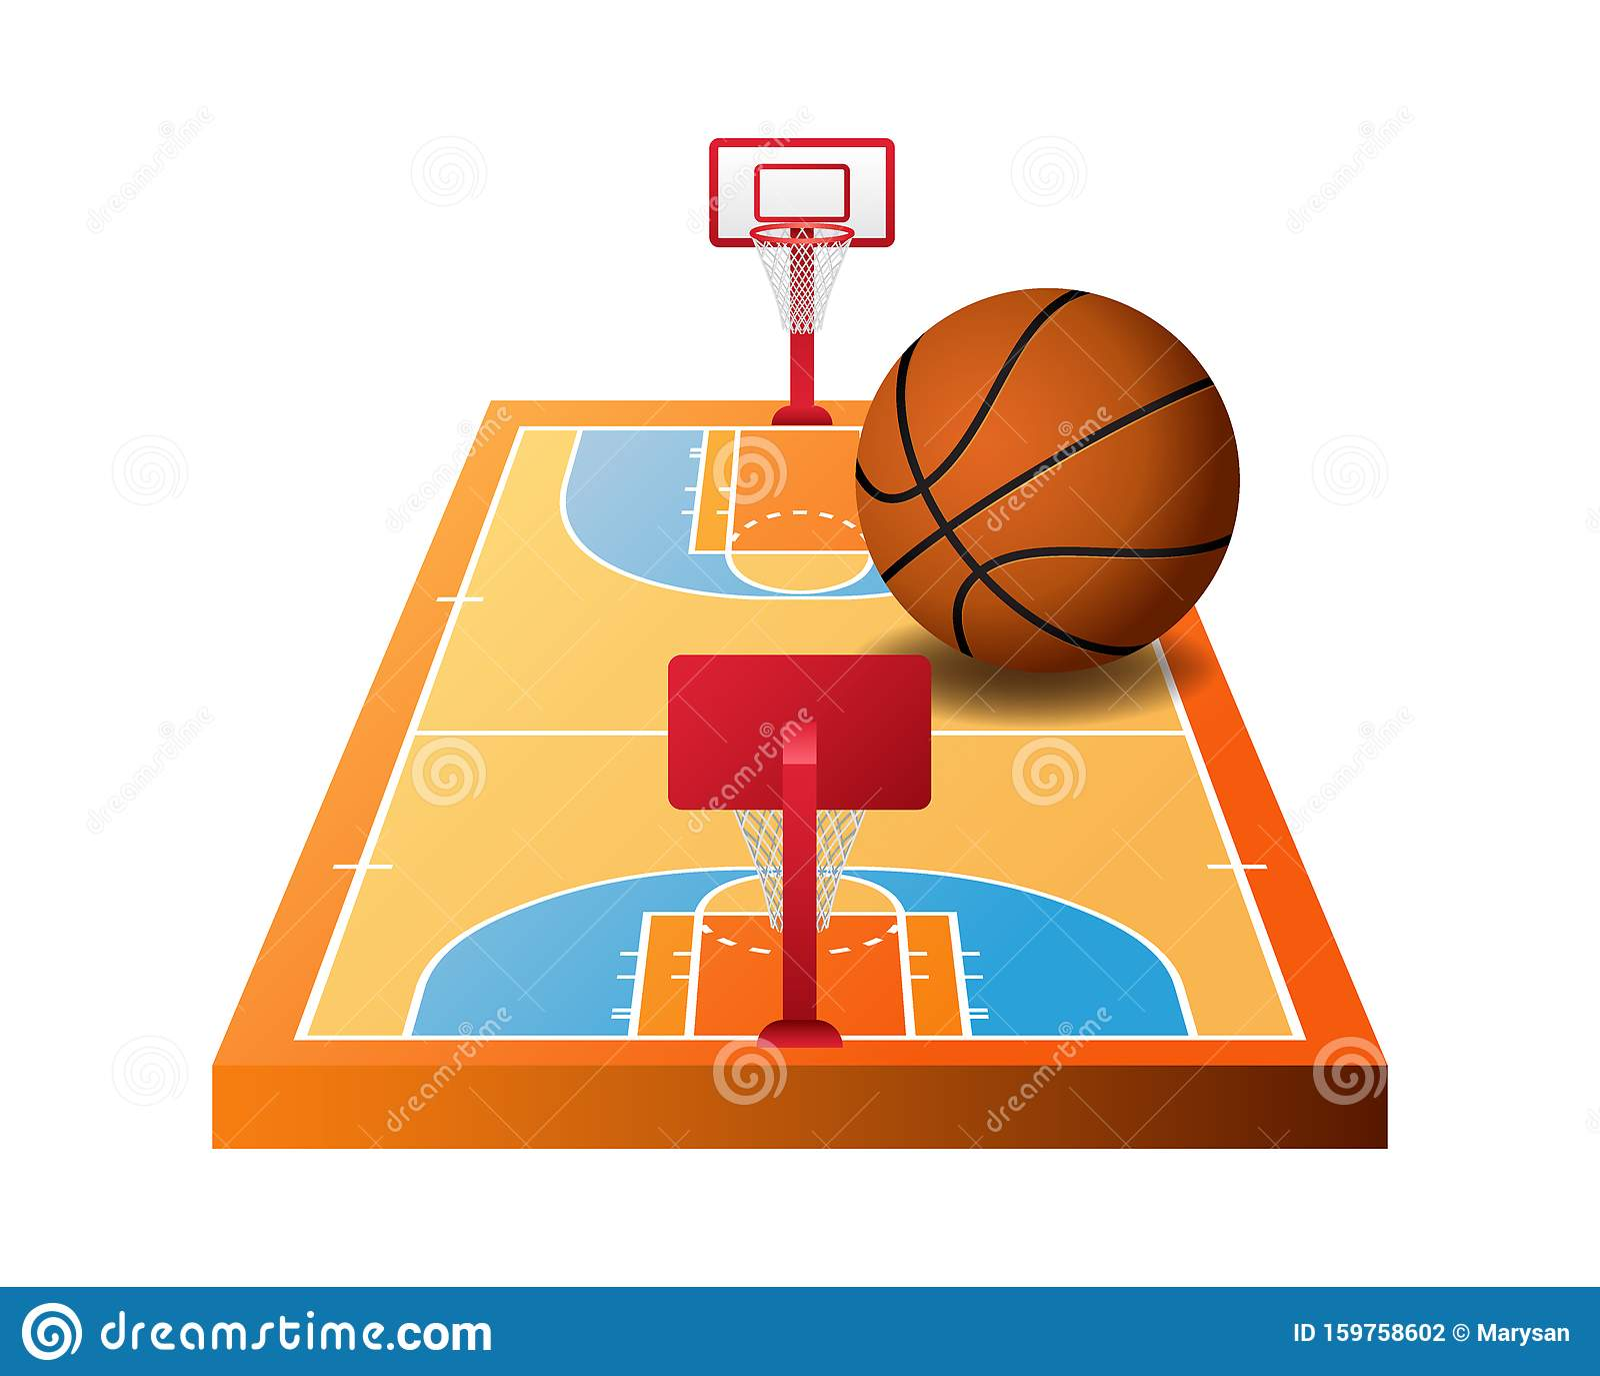 DIAGRAM] Full Court Basketball Court Diagram FULL Version HD Quality Court  Diagram - GUIDERONIN.PRIMACASA-IMMOBILIARE.IT